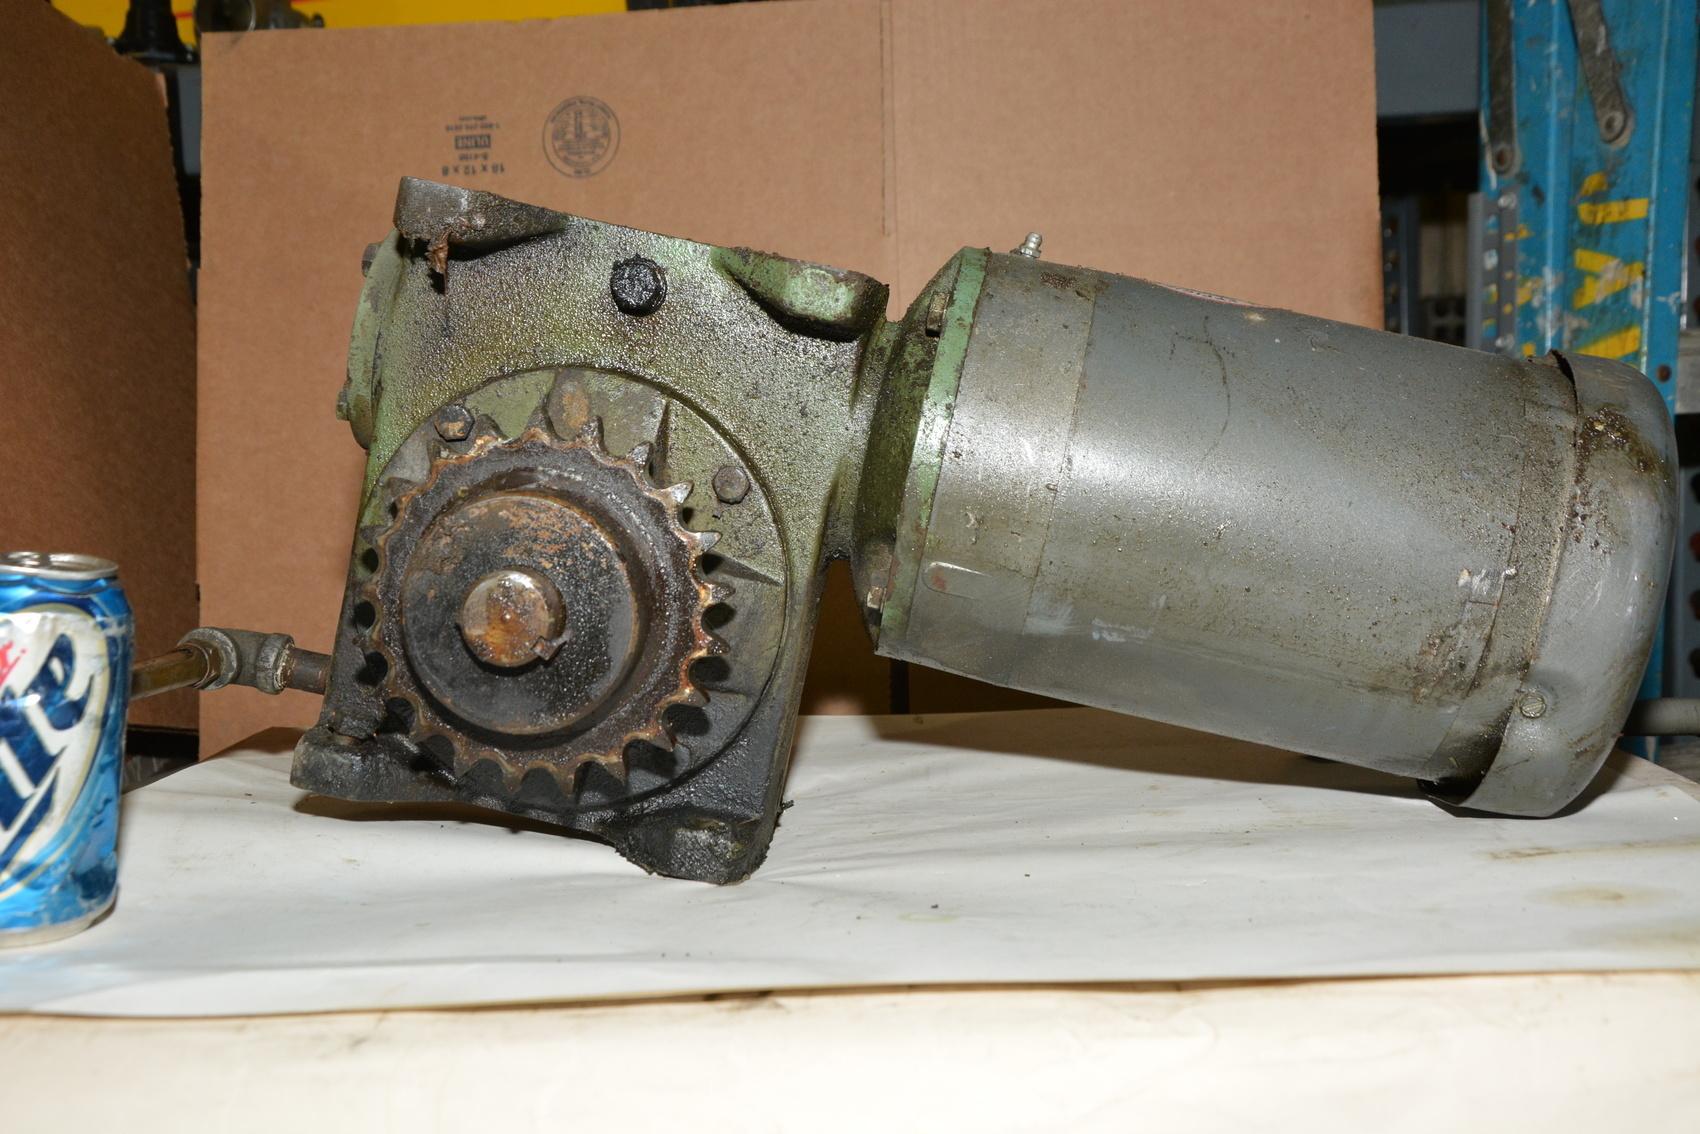 Baldor 1 5 Hp Gear Motor 3 Ph 1725 Rpm Vm3554t Inv 19913